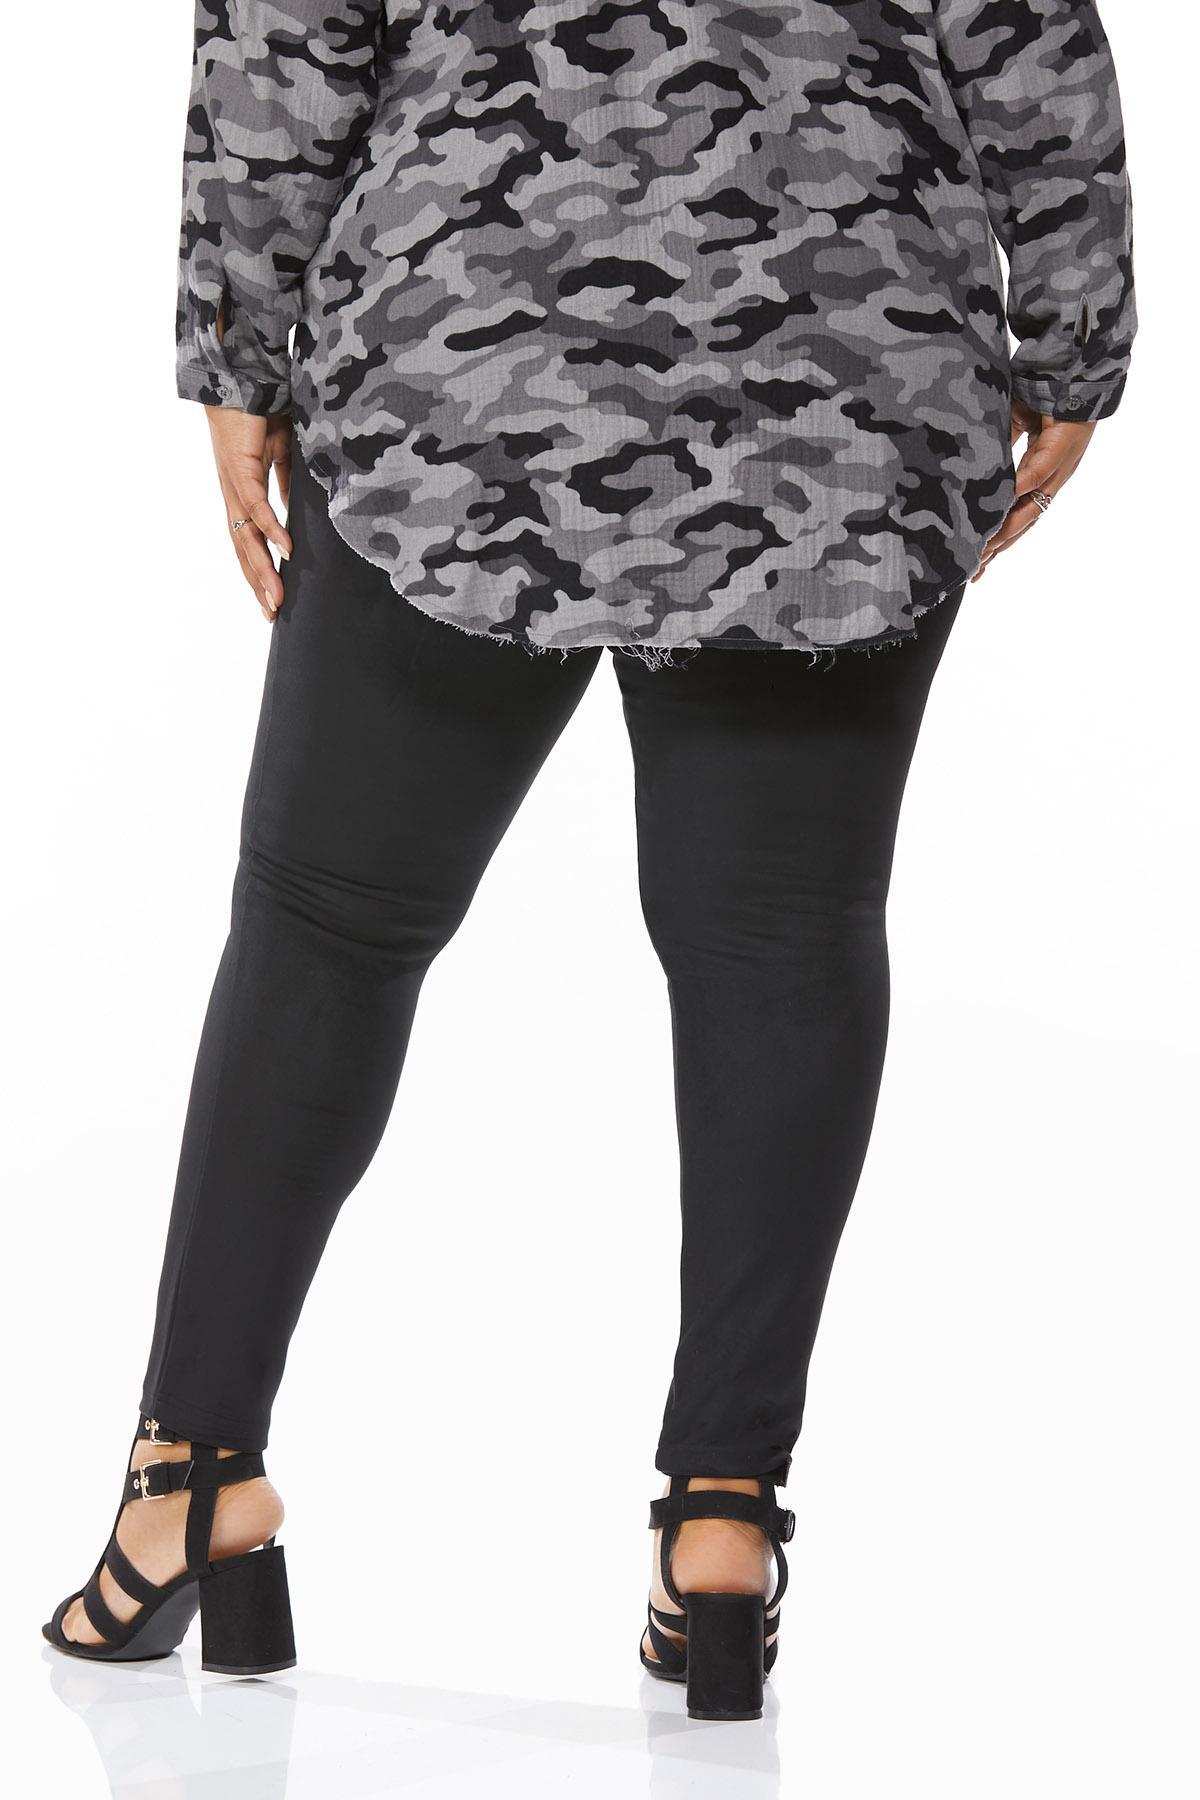 Plus Size Faux Suede Leggings (Item #44655788)